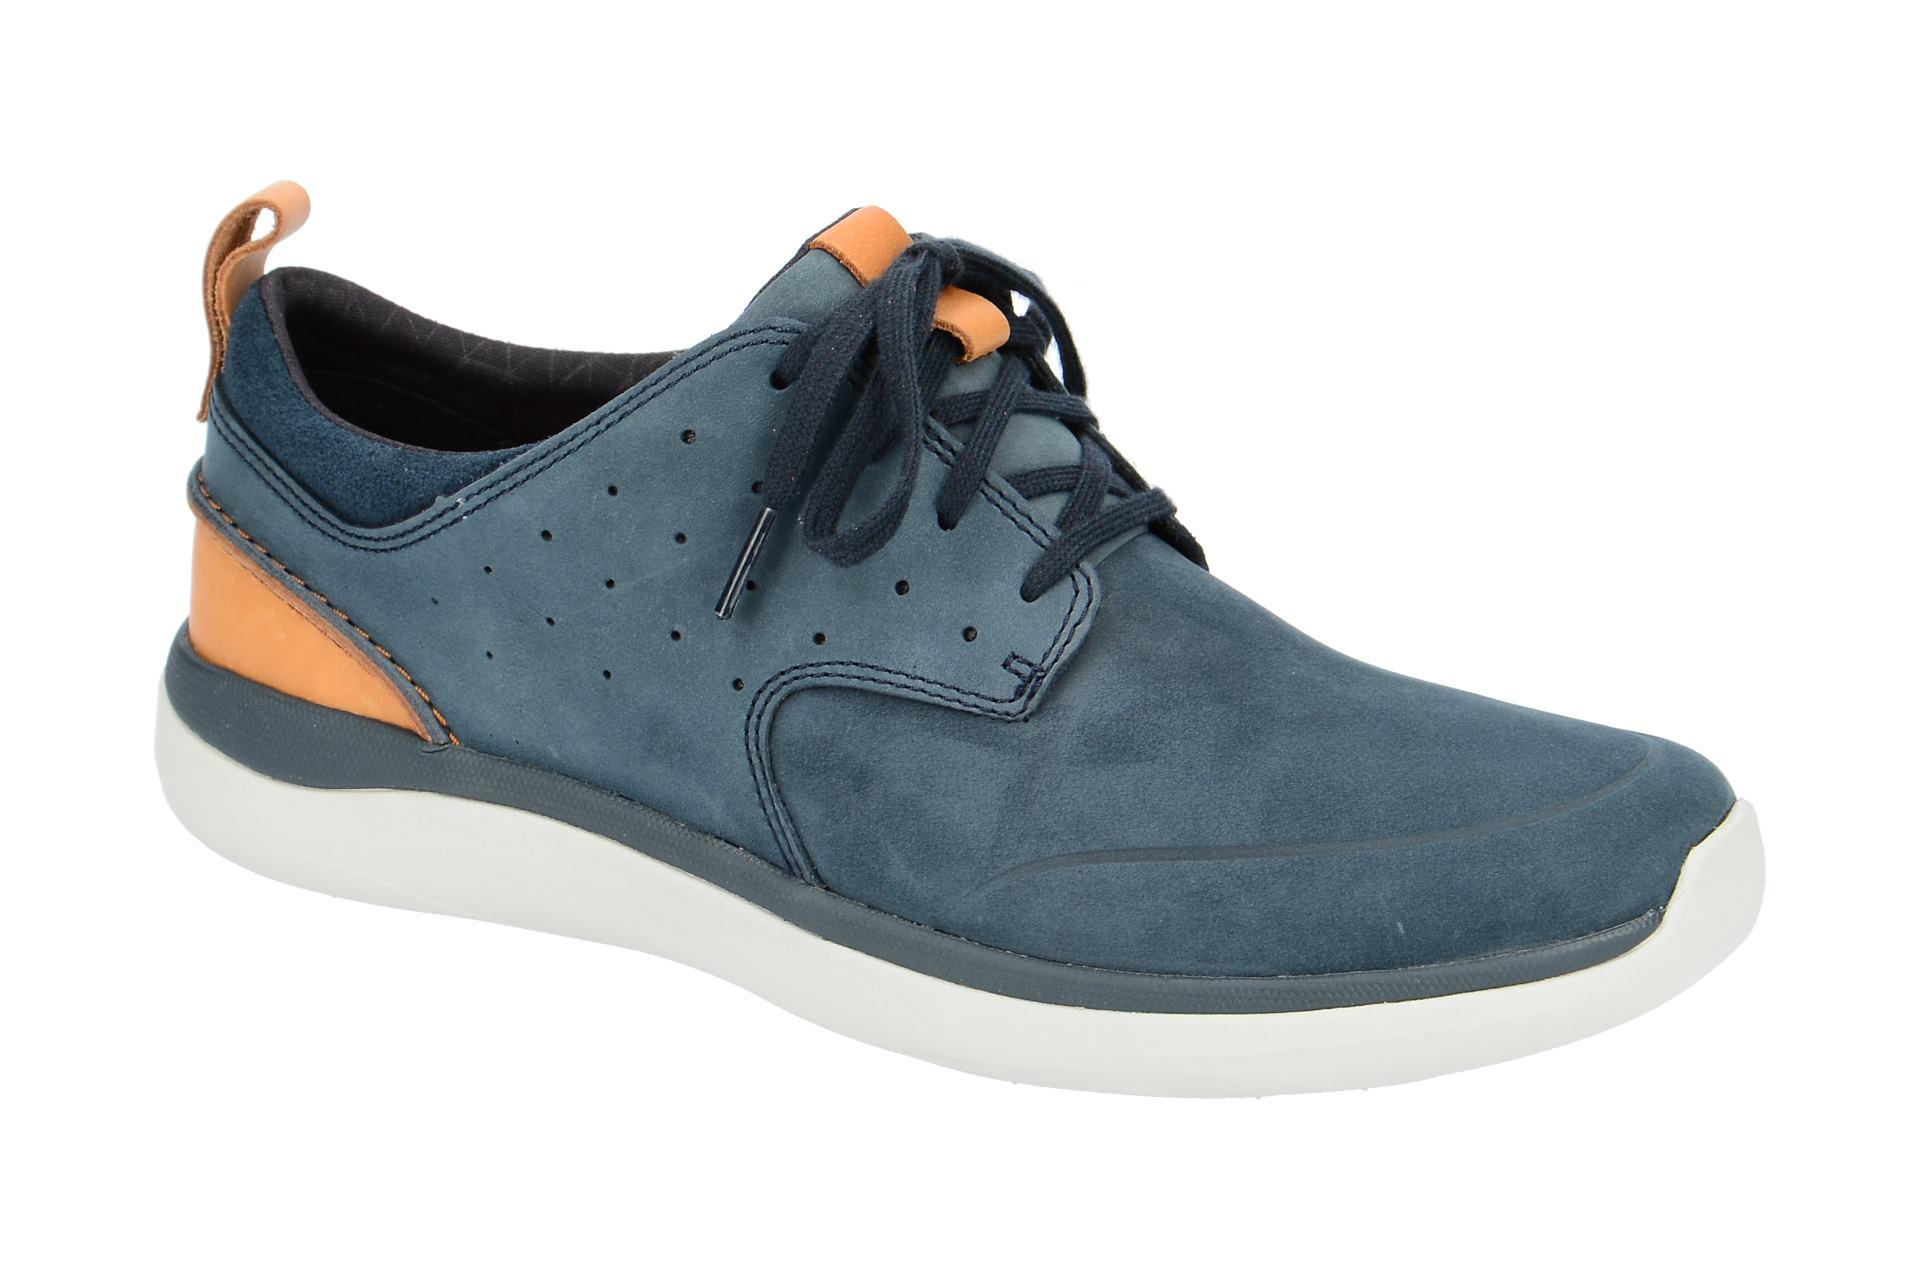 wholesale dealer c4c3a c935e Details zu Clarks Schuhe GARRATT LACE blau Herrenschuhe 26132295 7 NEU